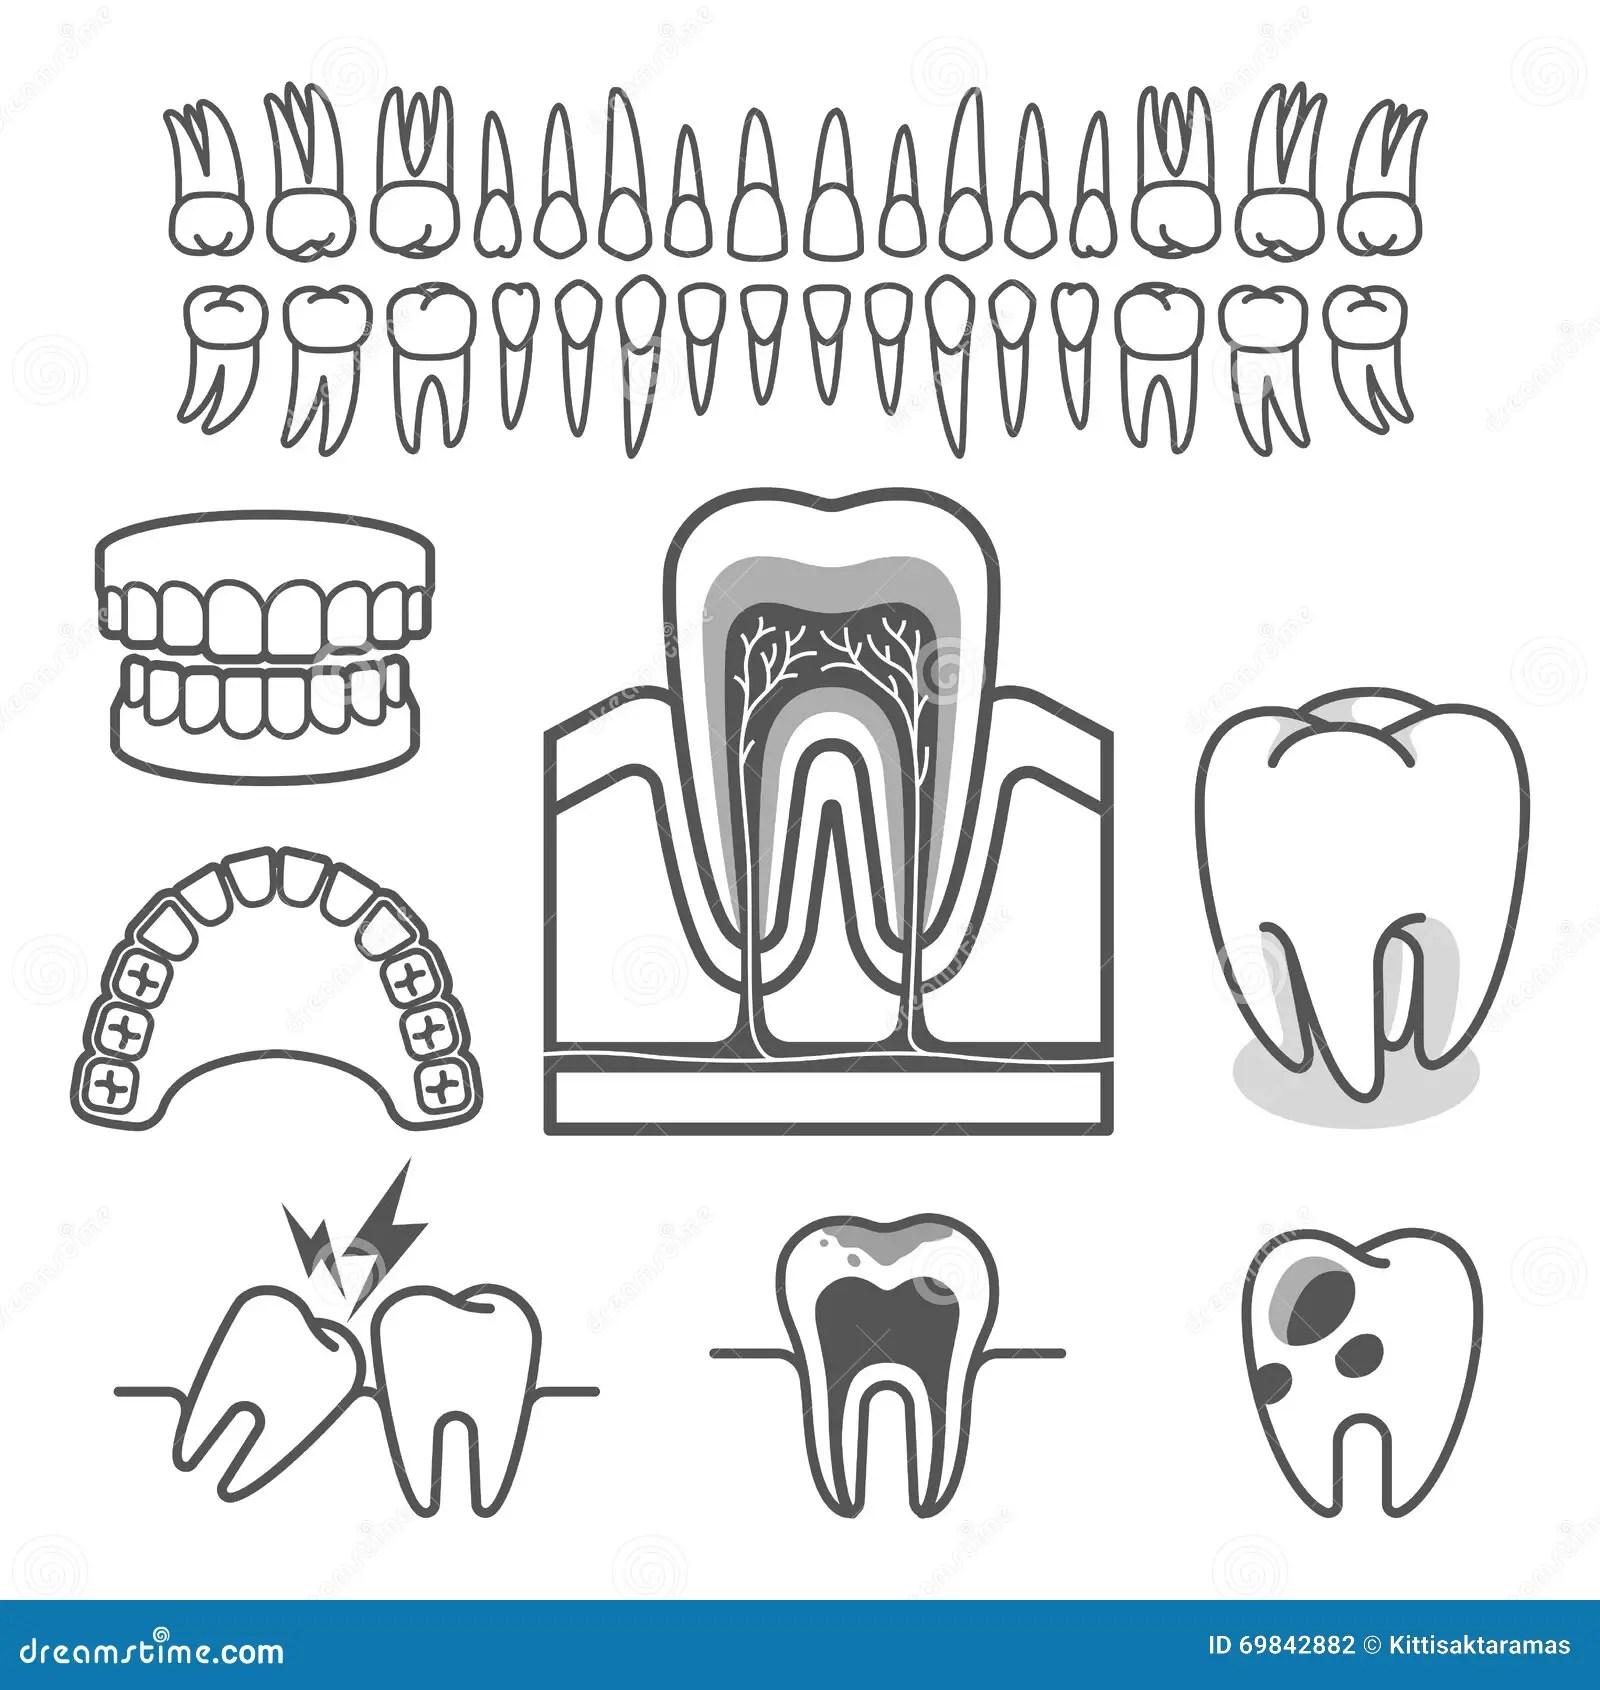 Human Tooth Anatomy Vector Stock Vector